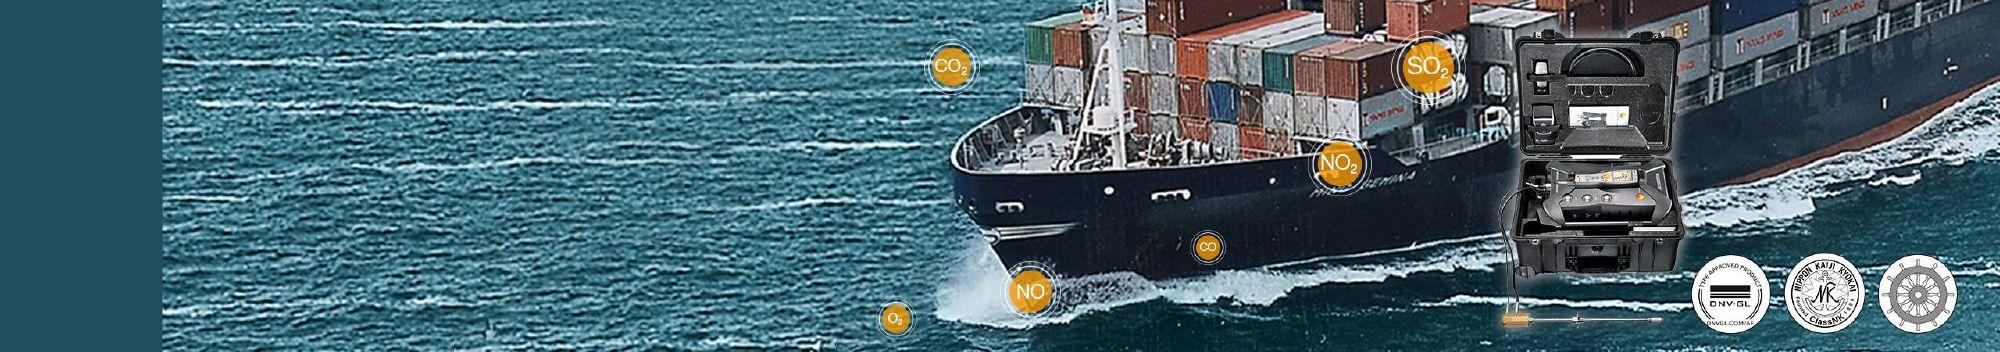 <b>船用柴油发动机</b>废气排放 </br>船用 testo 350